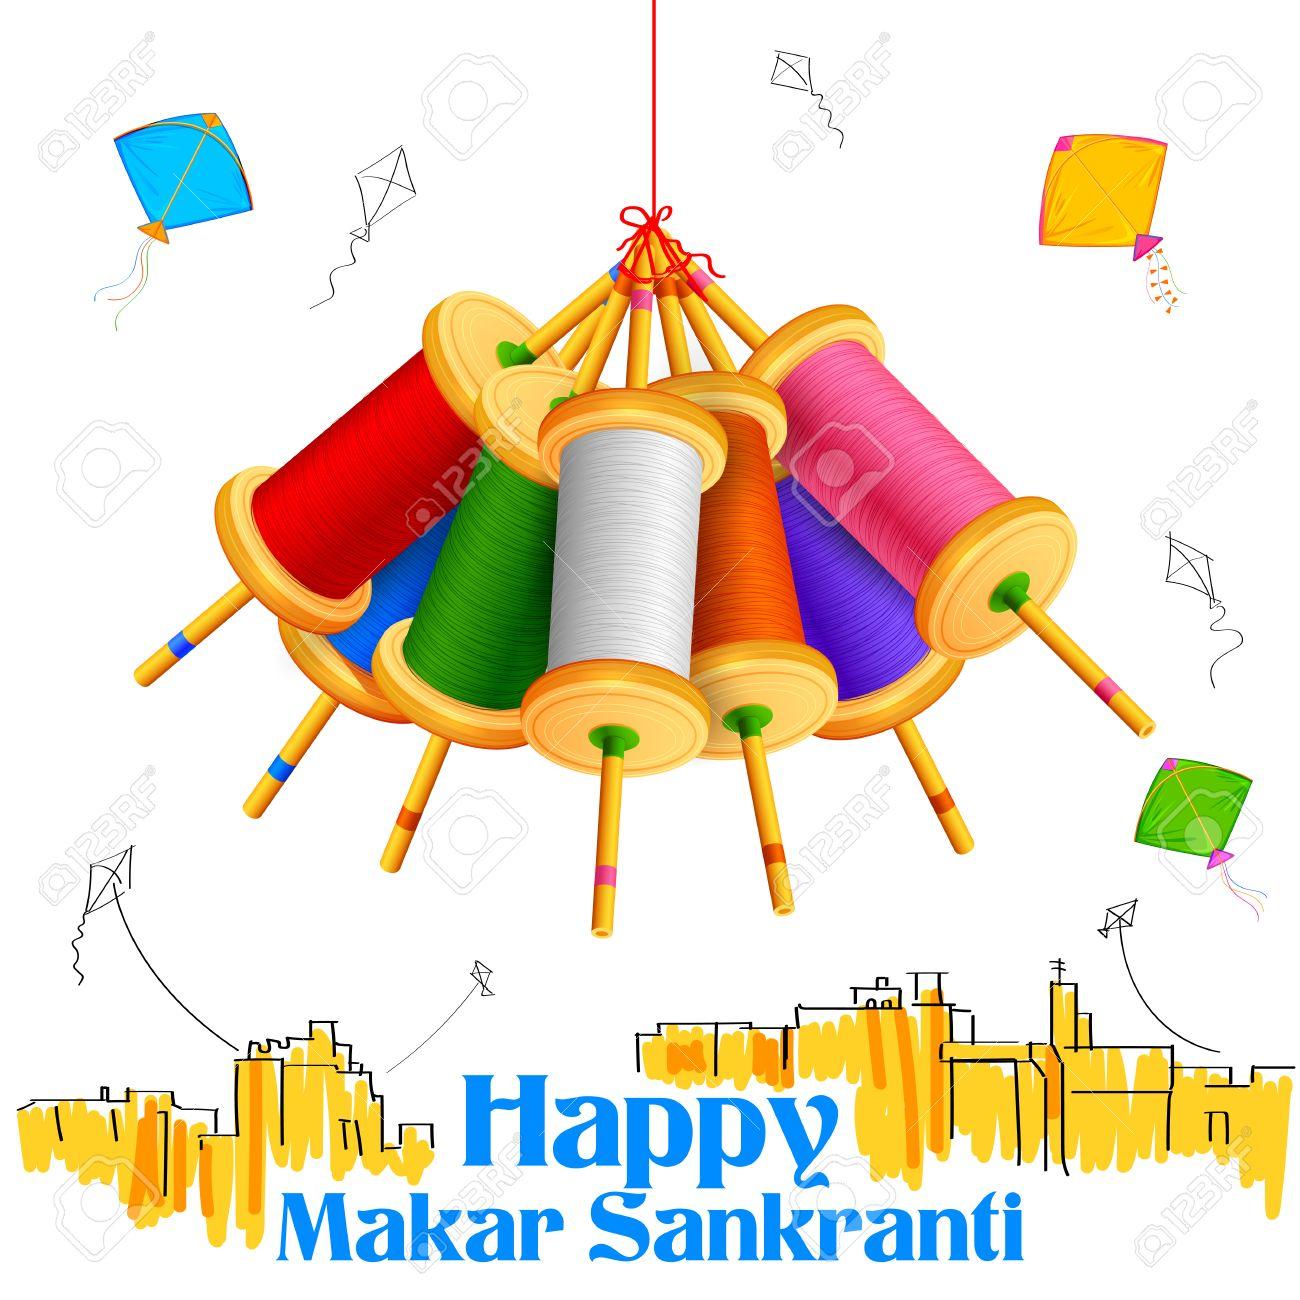 illustration of Makar Sankranti wallpaper with colorful kite string spool - 50223521